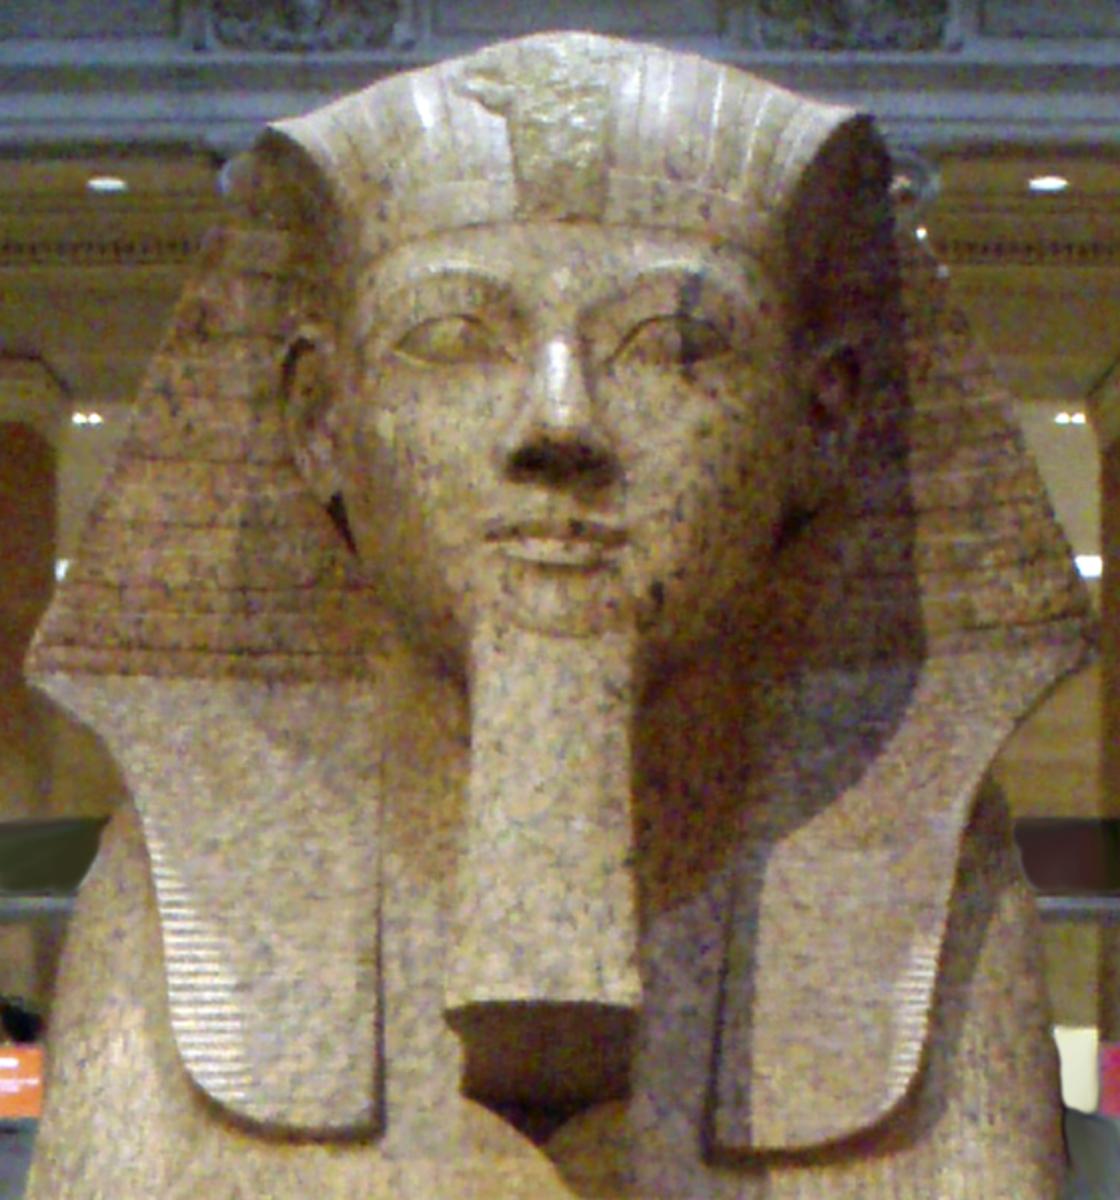 Large granite sphinx bearing the likeness of the female pharaoh Hatshepsut. Keith Schengili-Roberts CC-BY-SA-2.5